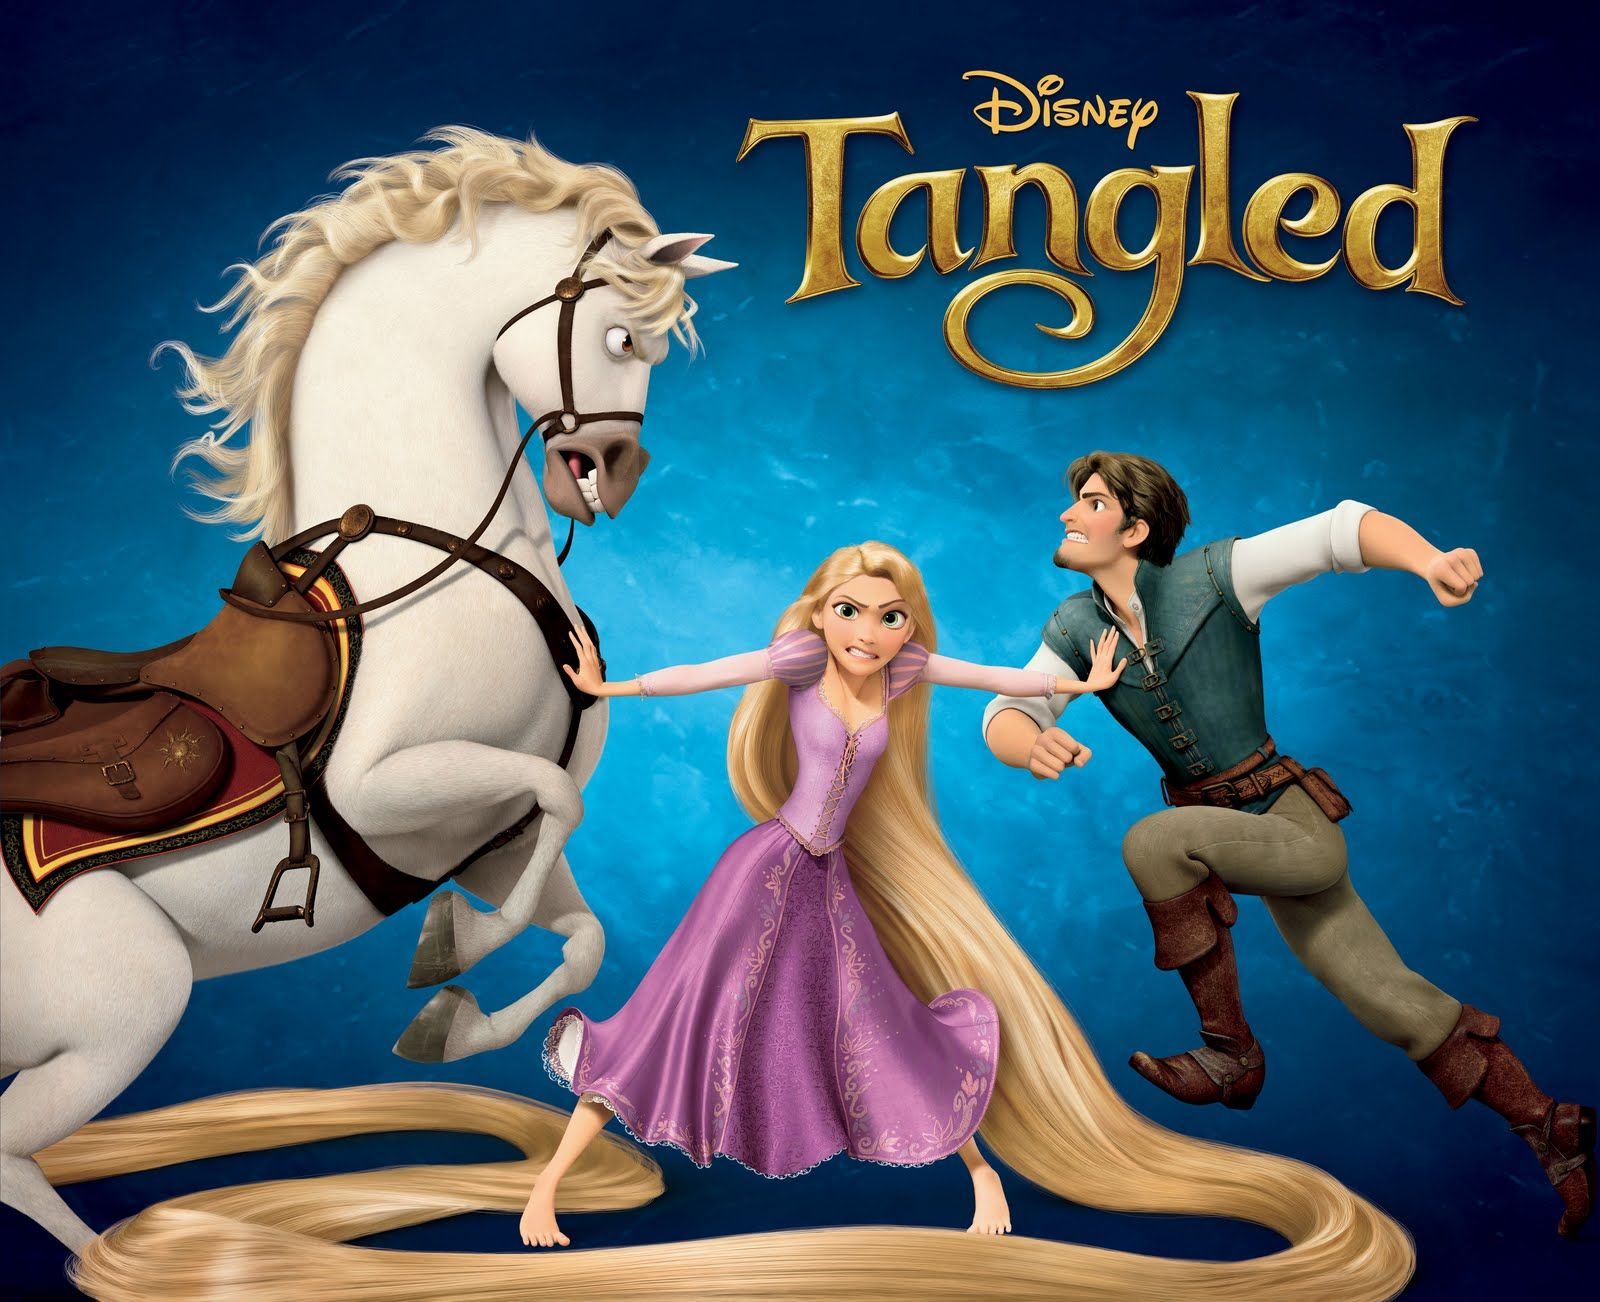 enredados-disney-rapunzel-tangled-maximus-flynn-rider.jpg (1600 ... for Tangled Wallpaper Rapunzel And Flynn  11lplpg